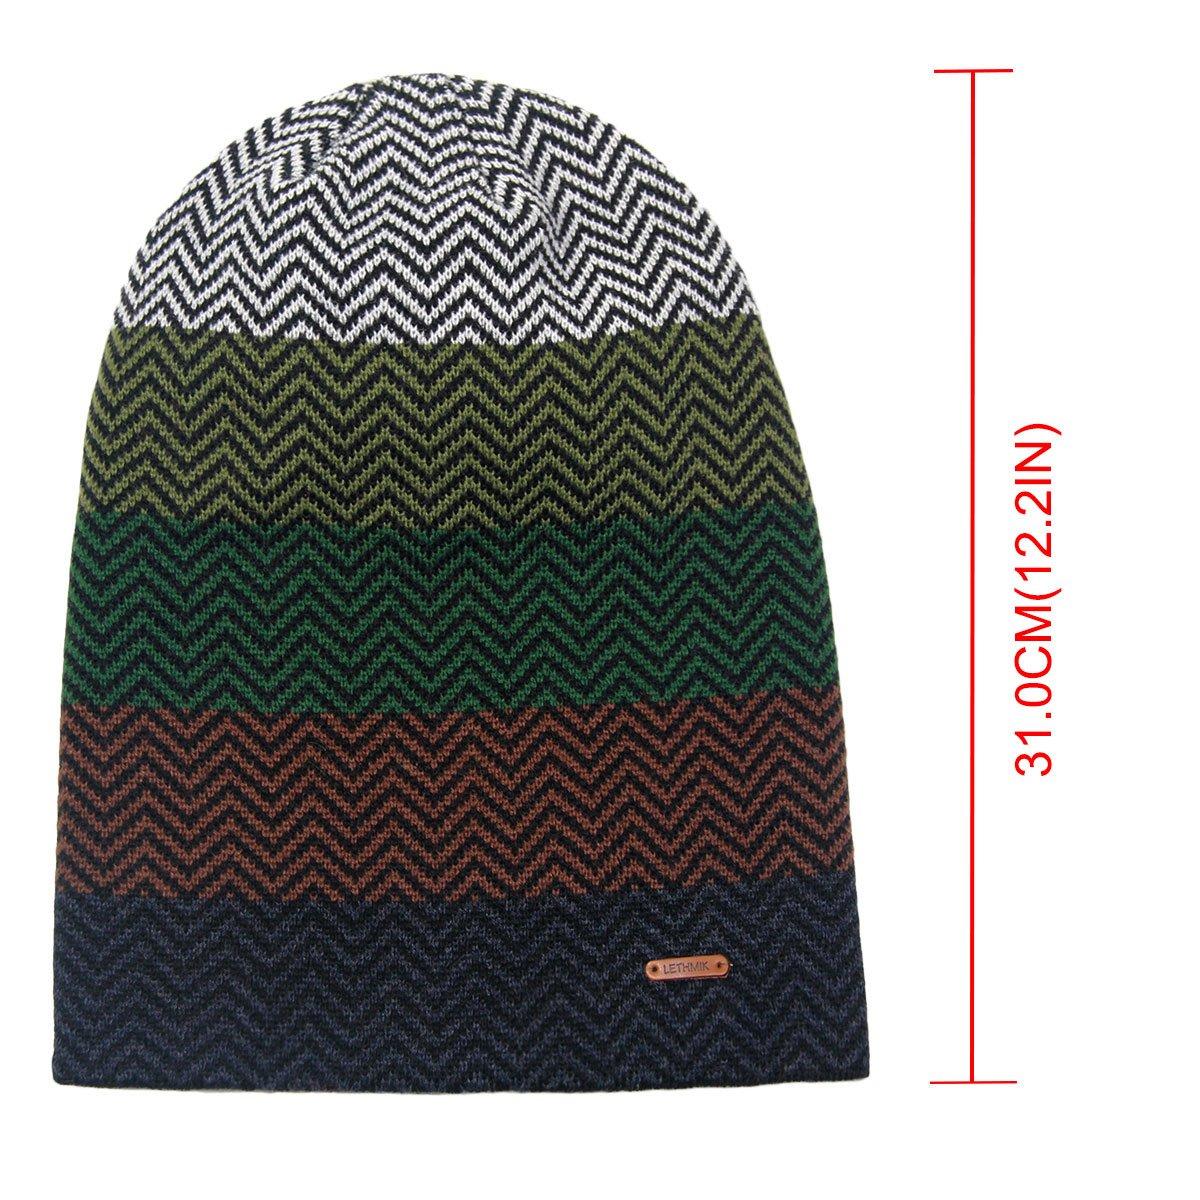 bac4007524127 LETHMIK Winter Long Slouchy Beanie Unique Mix Knit Ski Cap Hat Skully for  Men   Women Green at Amazon Men s Clothing store